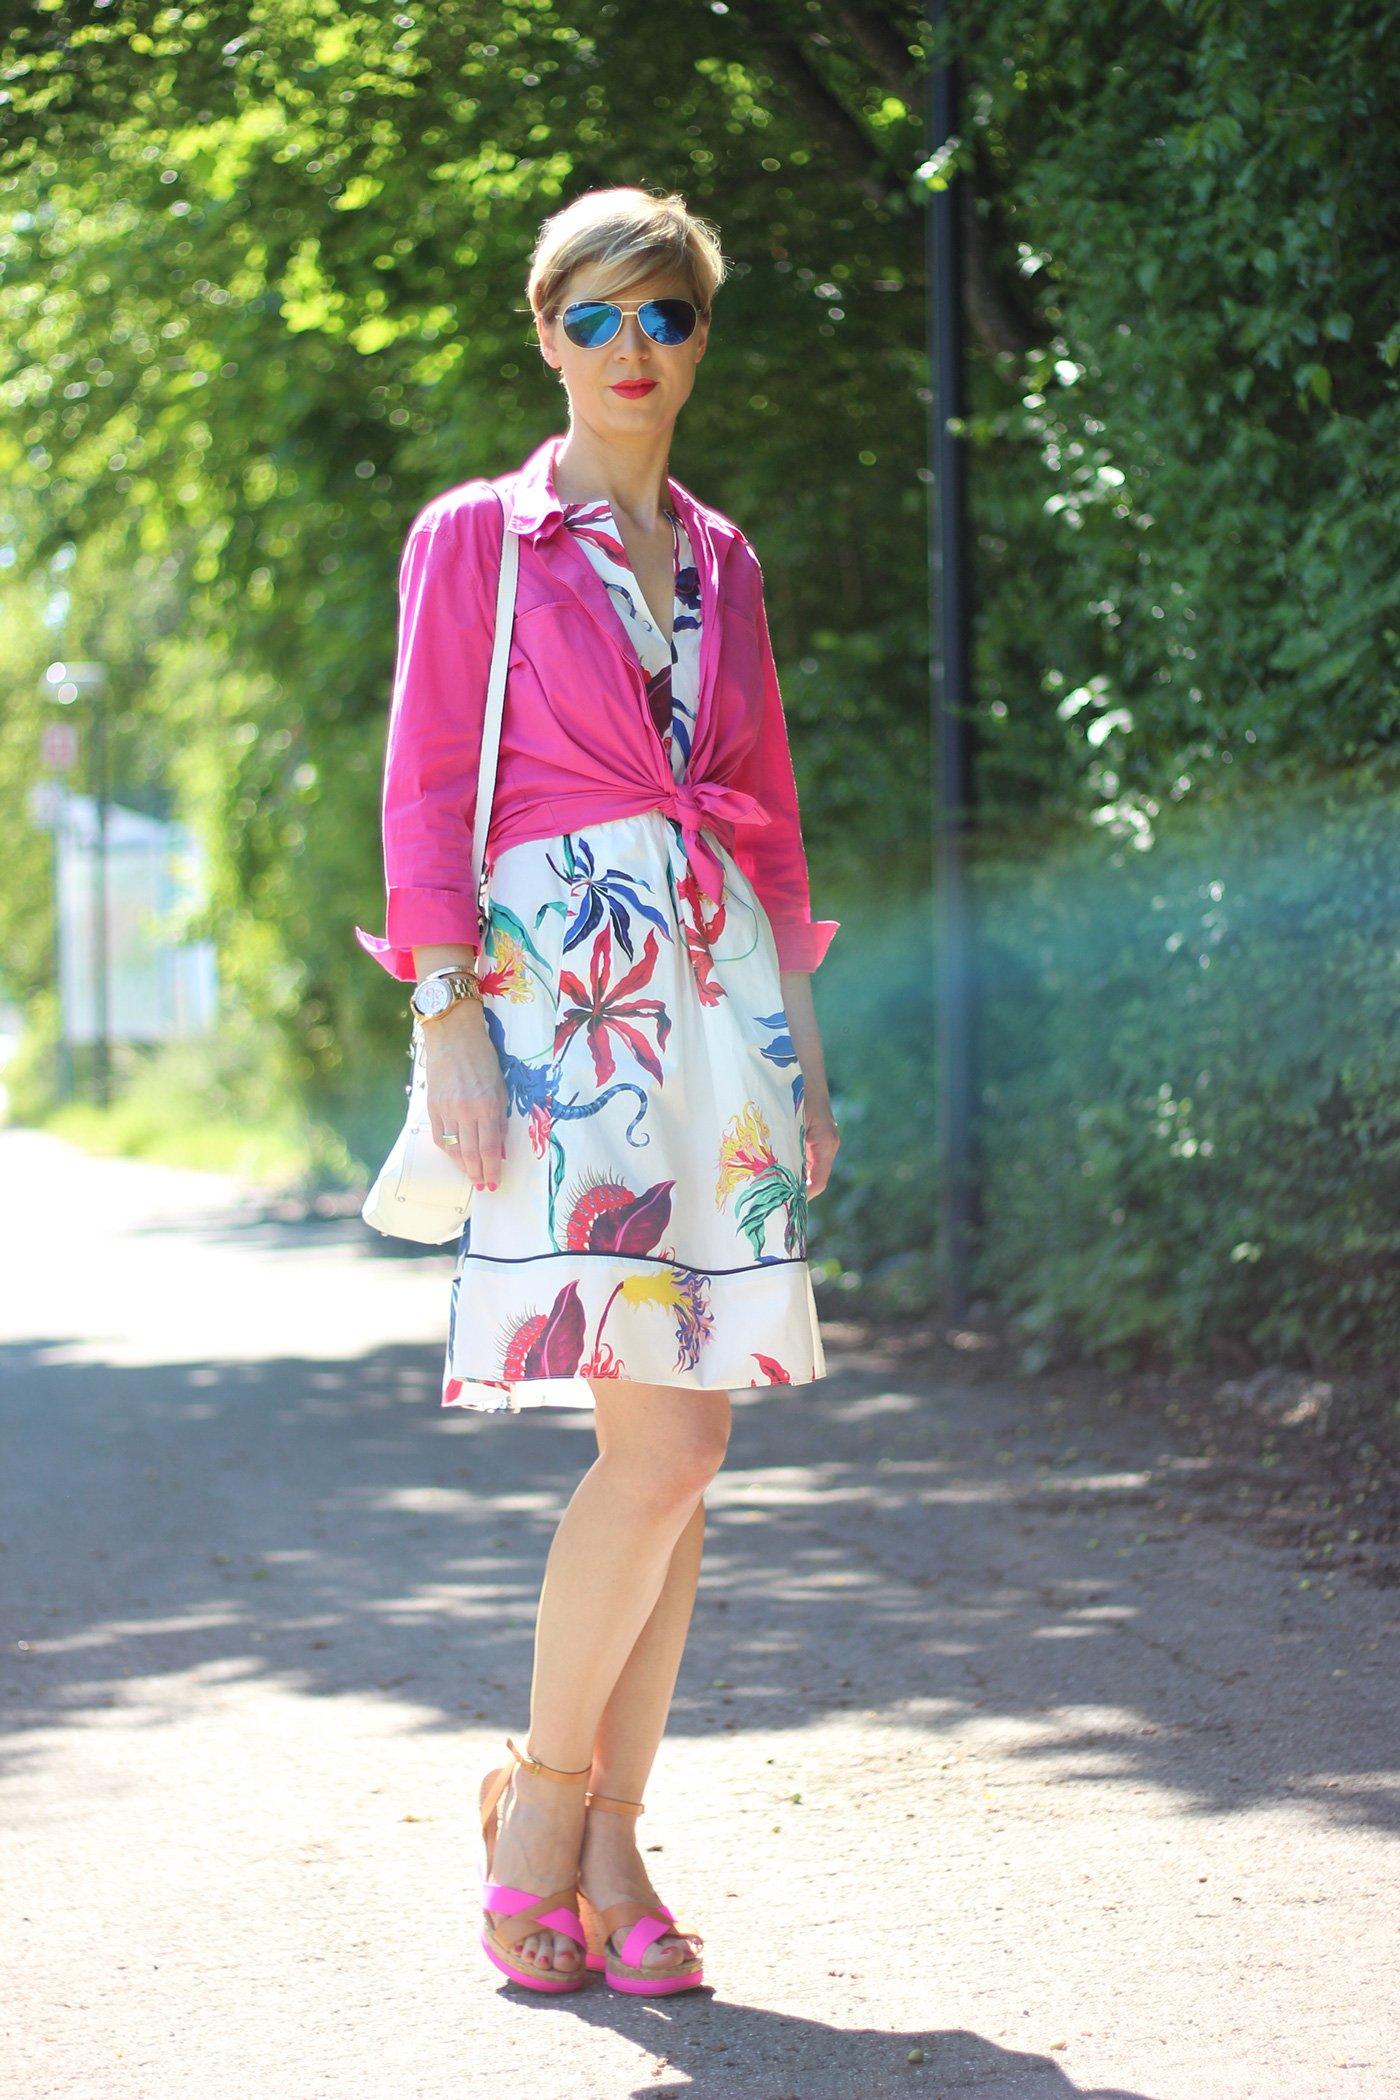 IMG_5913a_Blumenkleid_Flower_Dress_ConnyDoll_AHemadundaHos_Sommerkleid_summerdress